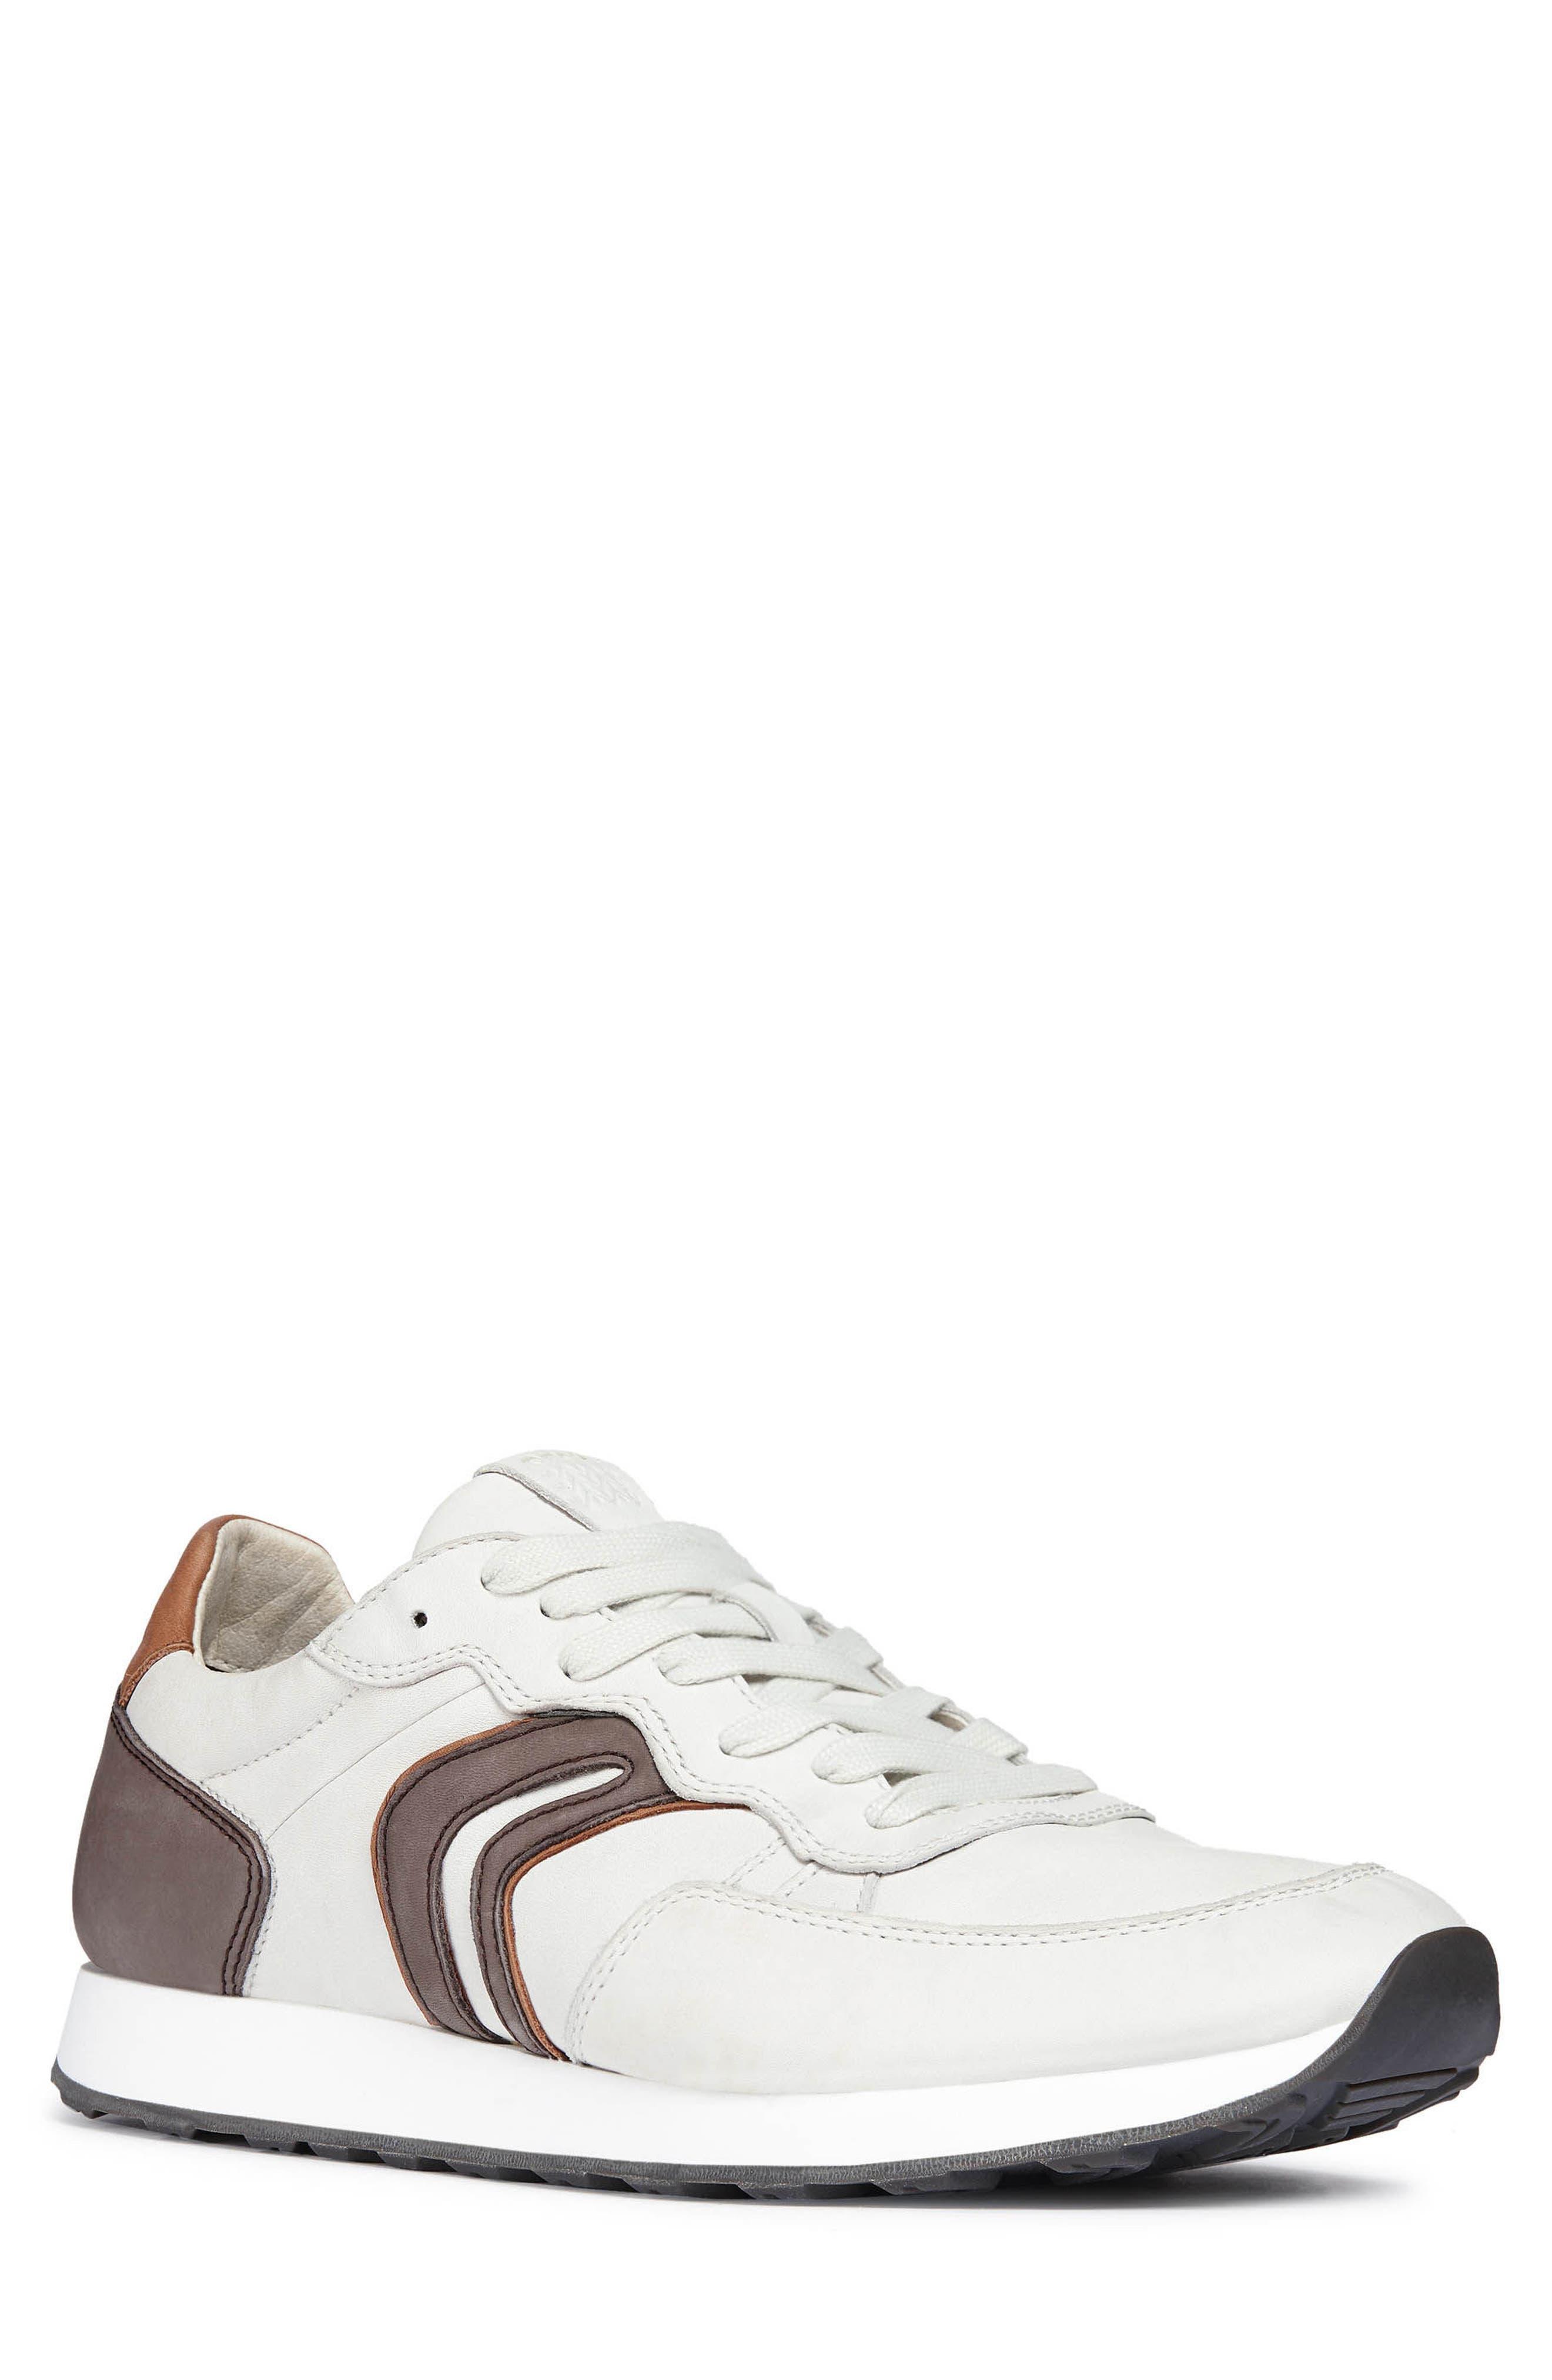 Geox Vincint 1 Sneaker, White